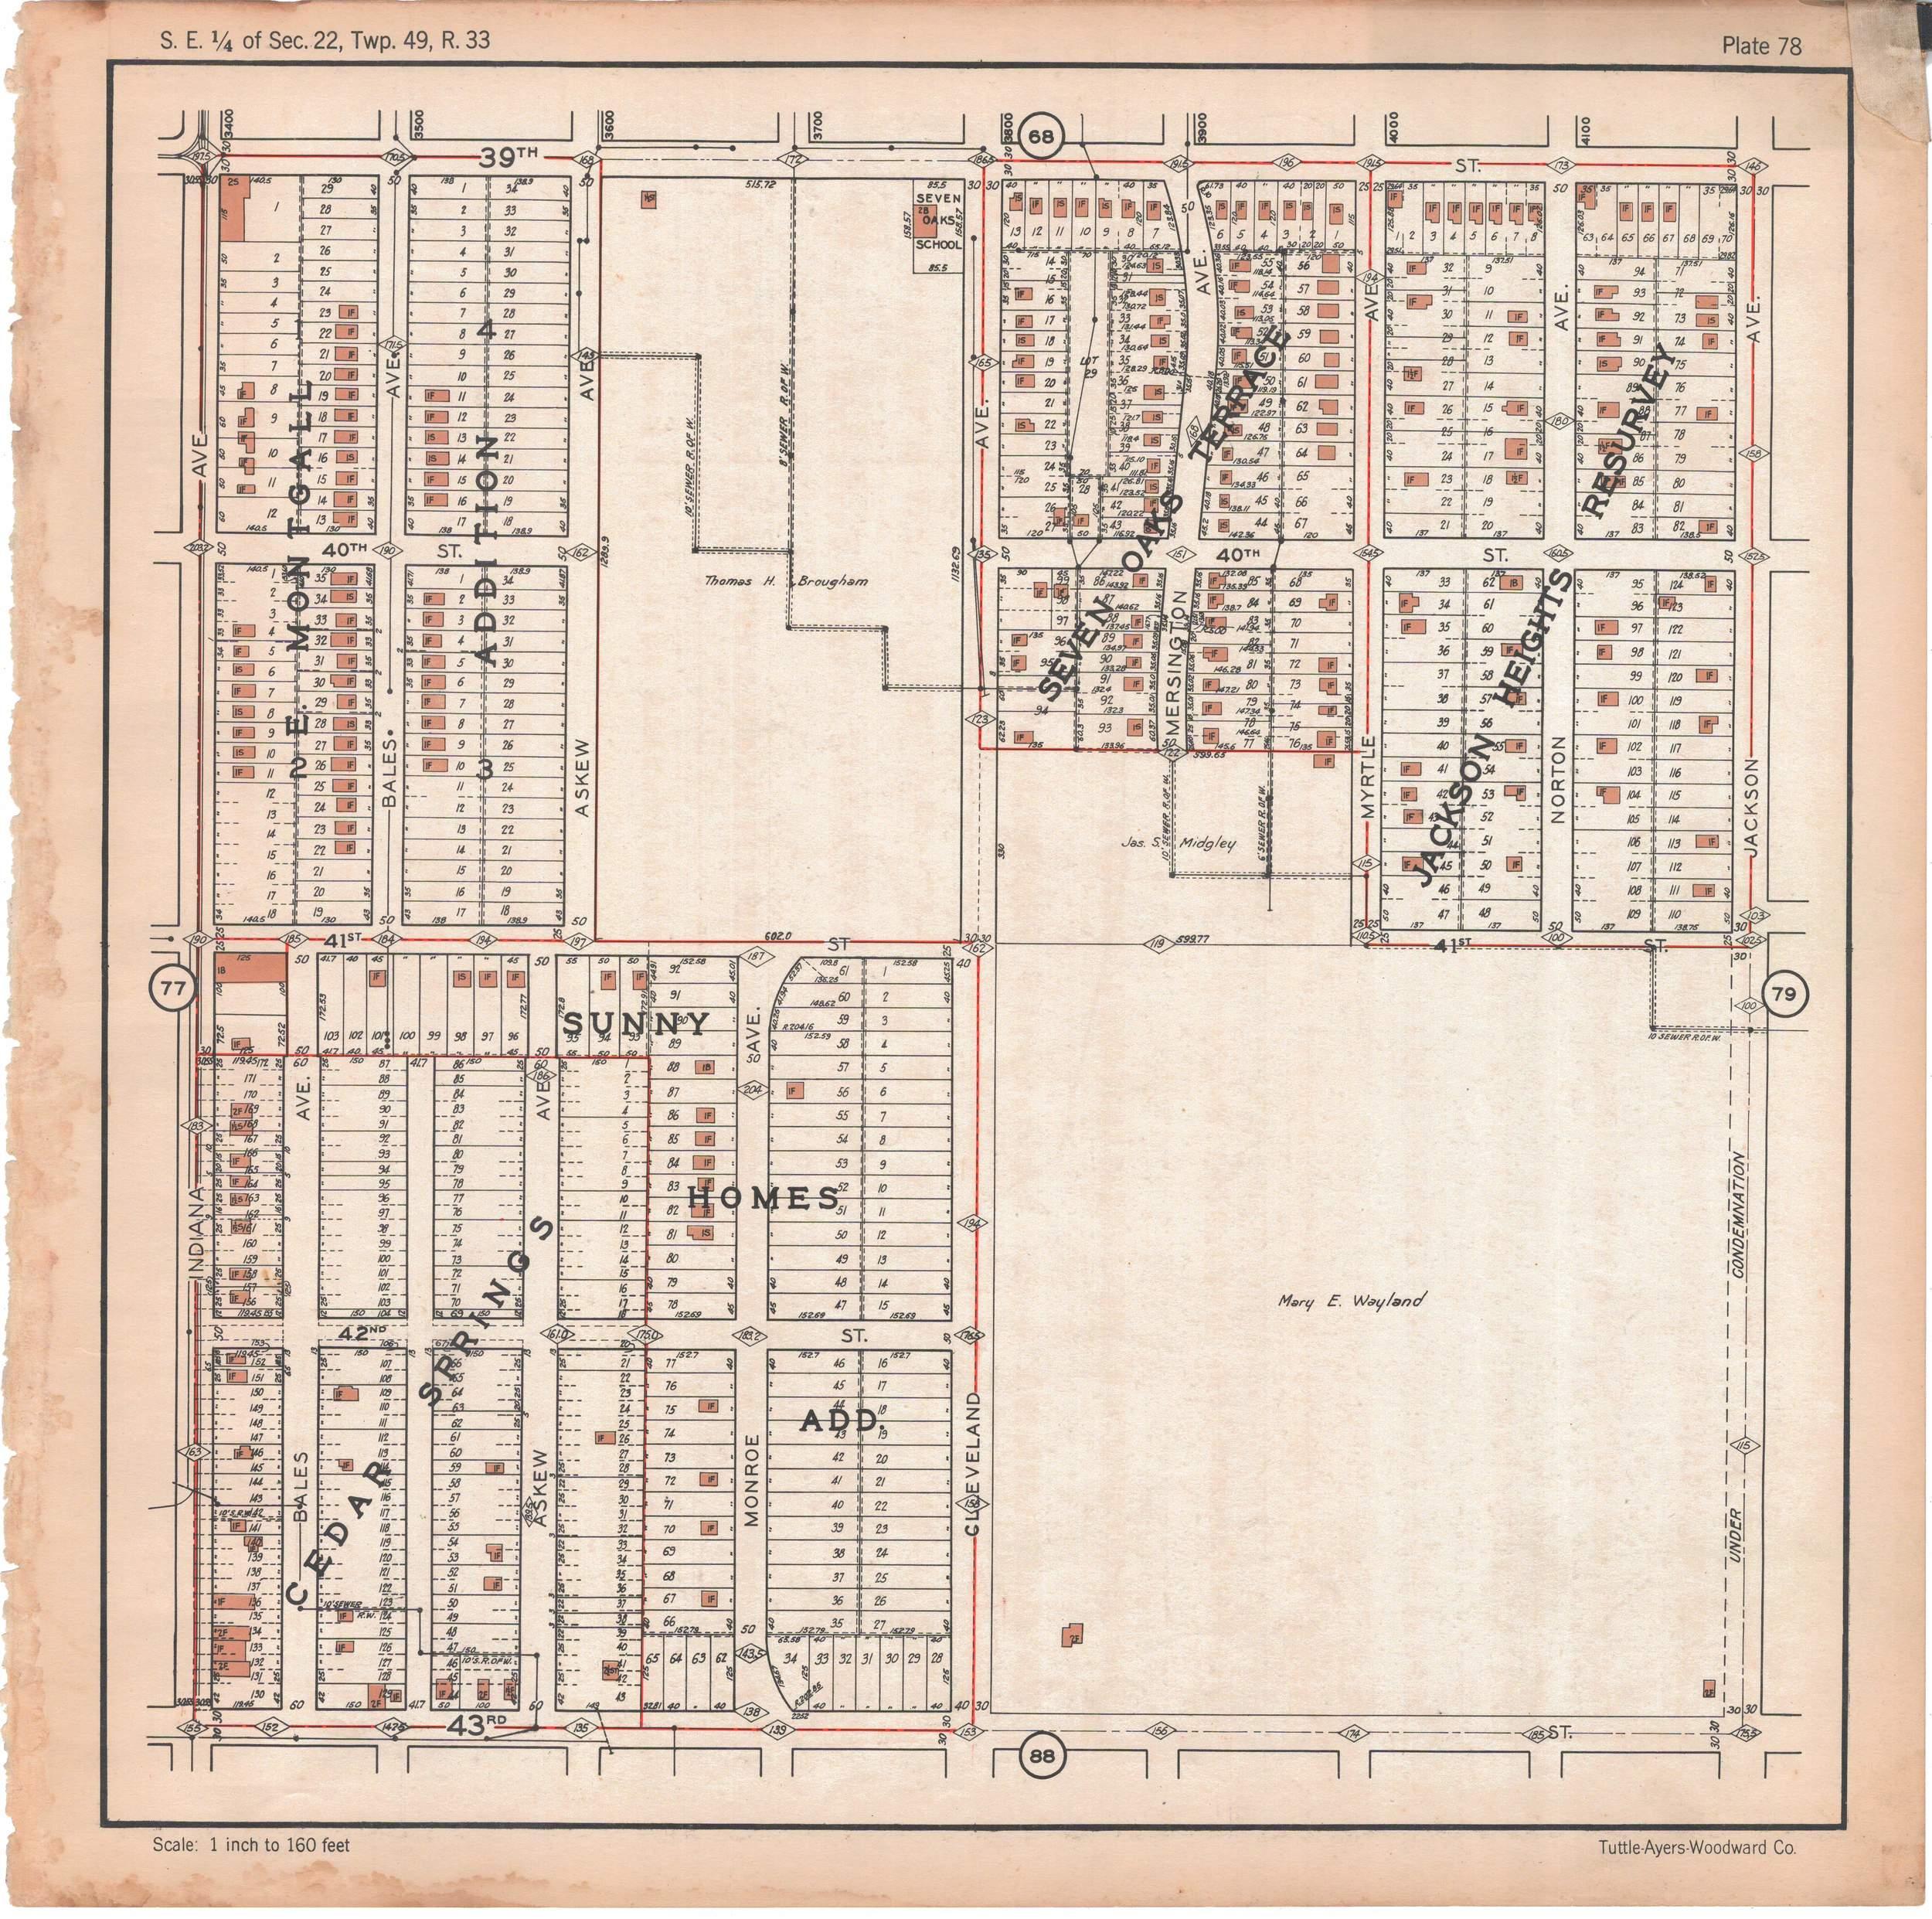 1925 TUTTLE_AYERS_Plate 78.JPG